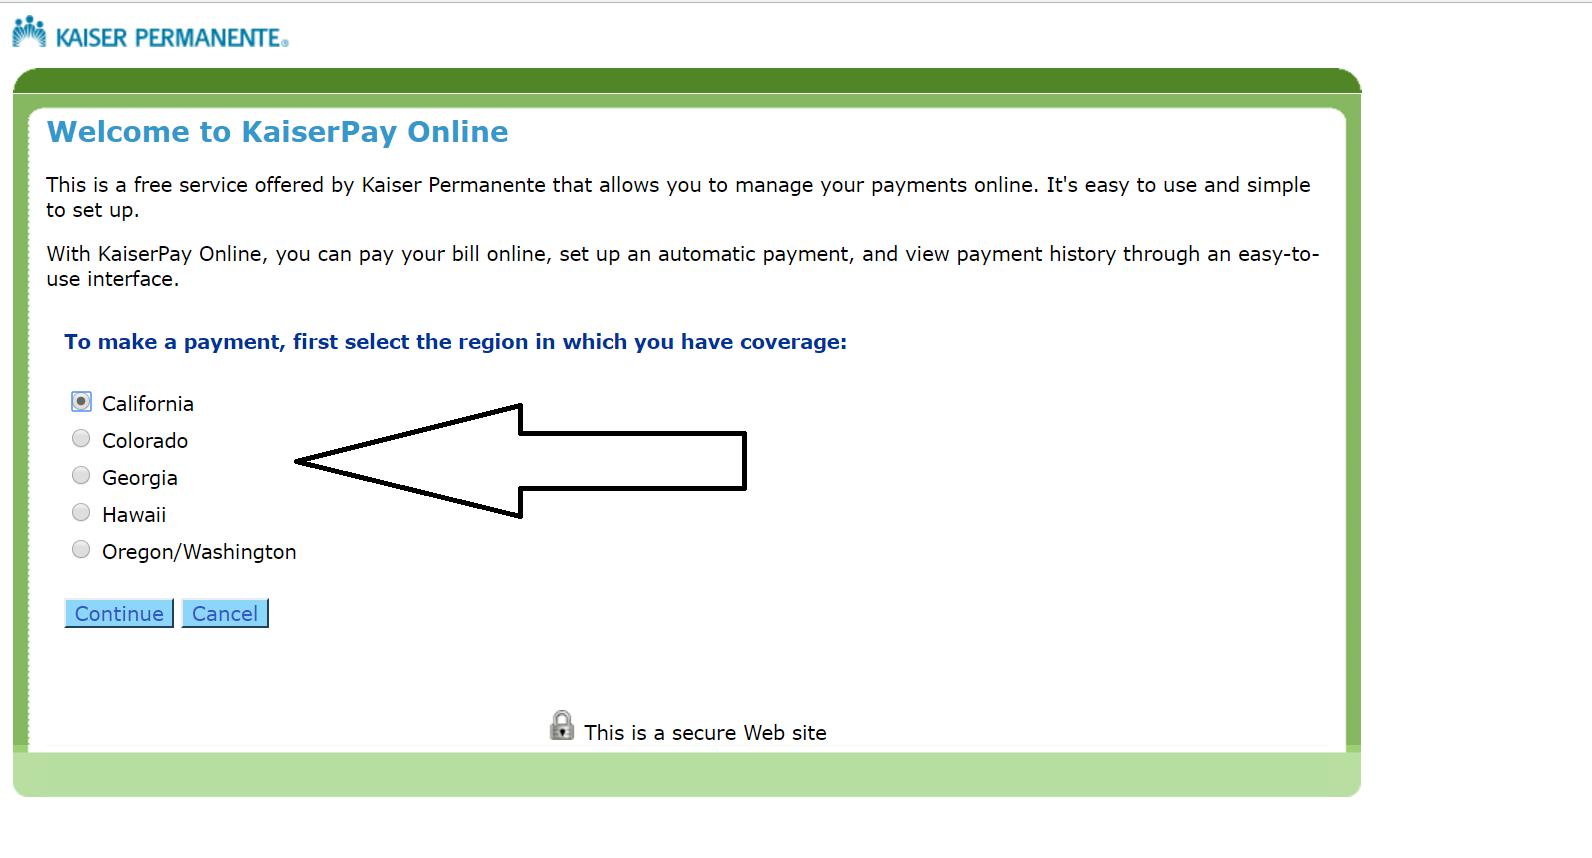 kaiser permanente online payment photo - 1